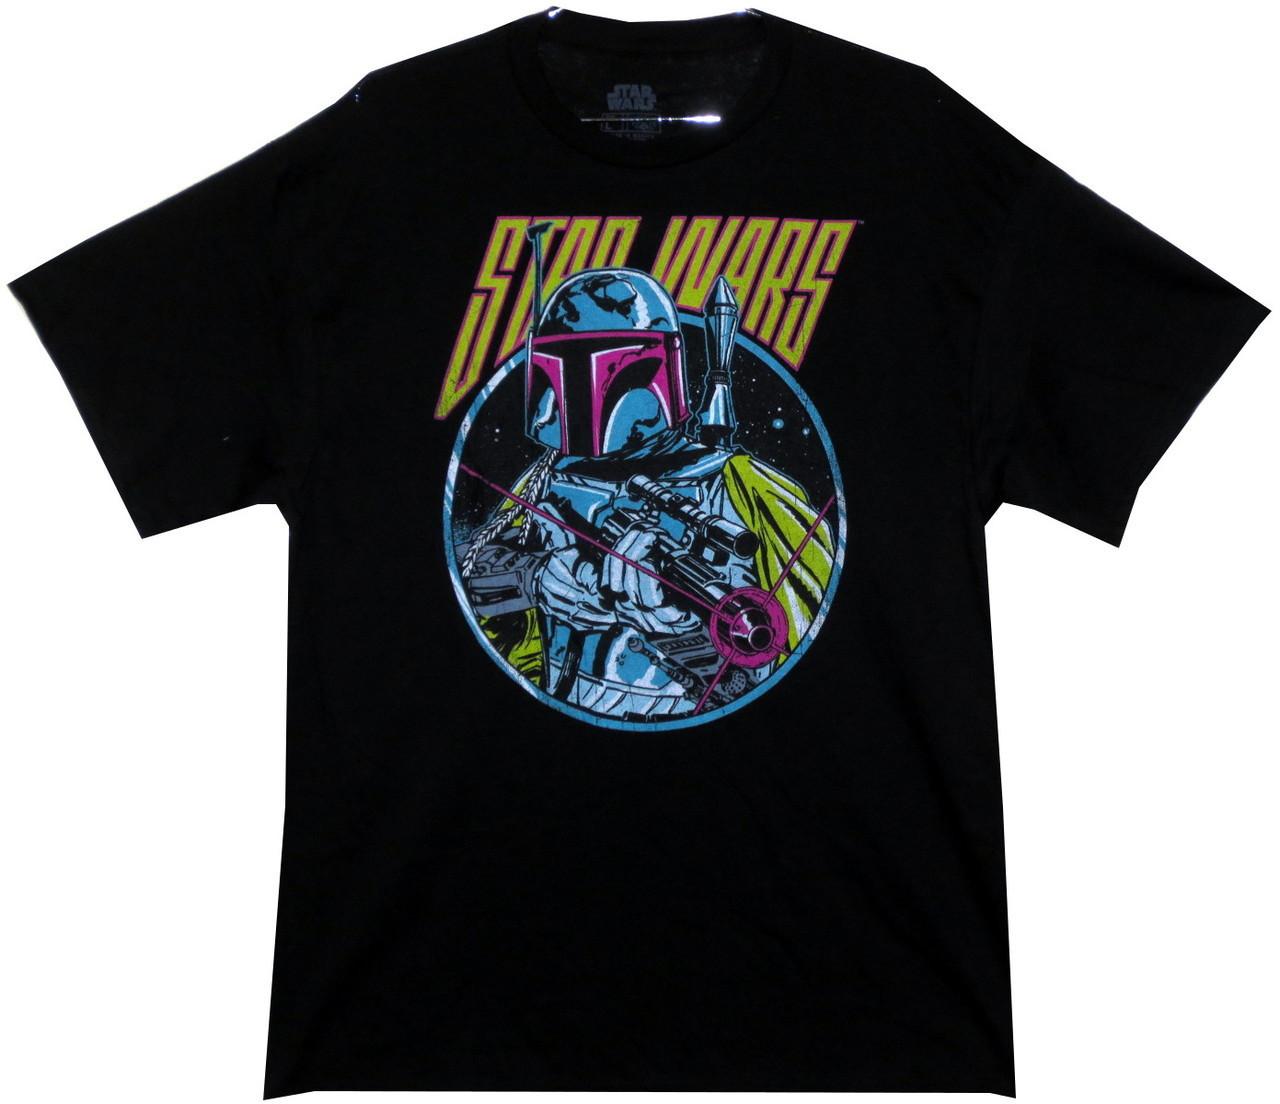 6177d63b7f55cd Star Wars T-Shirt - Retro 80s Boba Fett. Loading zoom